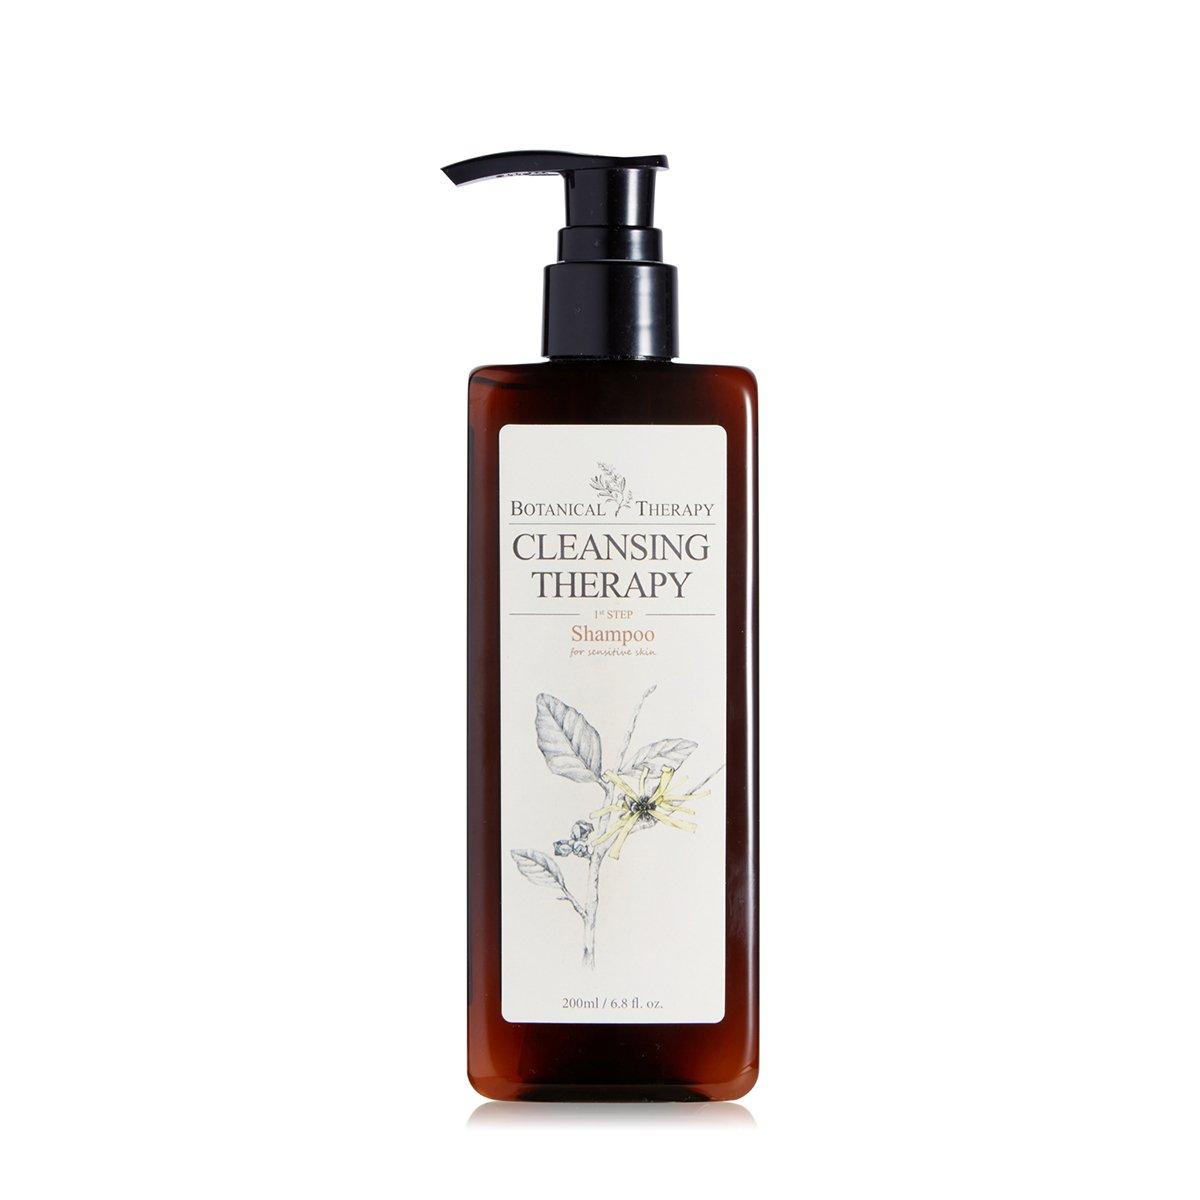 Botanical Therapy Pure Baby Shampoo with Calendula and Witch Hazel - Fragrance Free, 6.8 fl oz. Innobaby